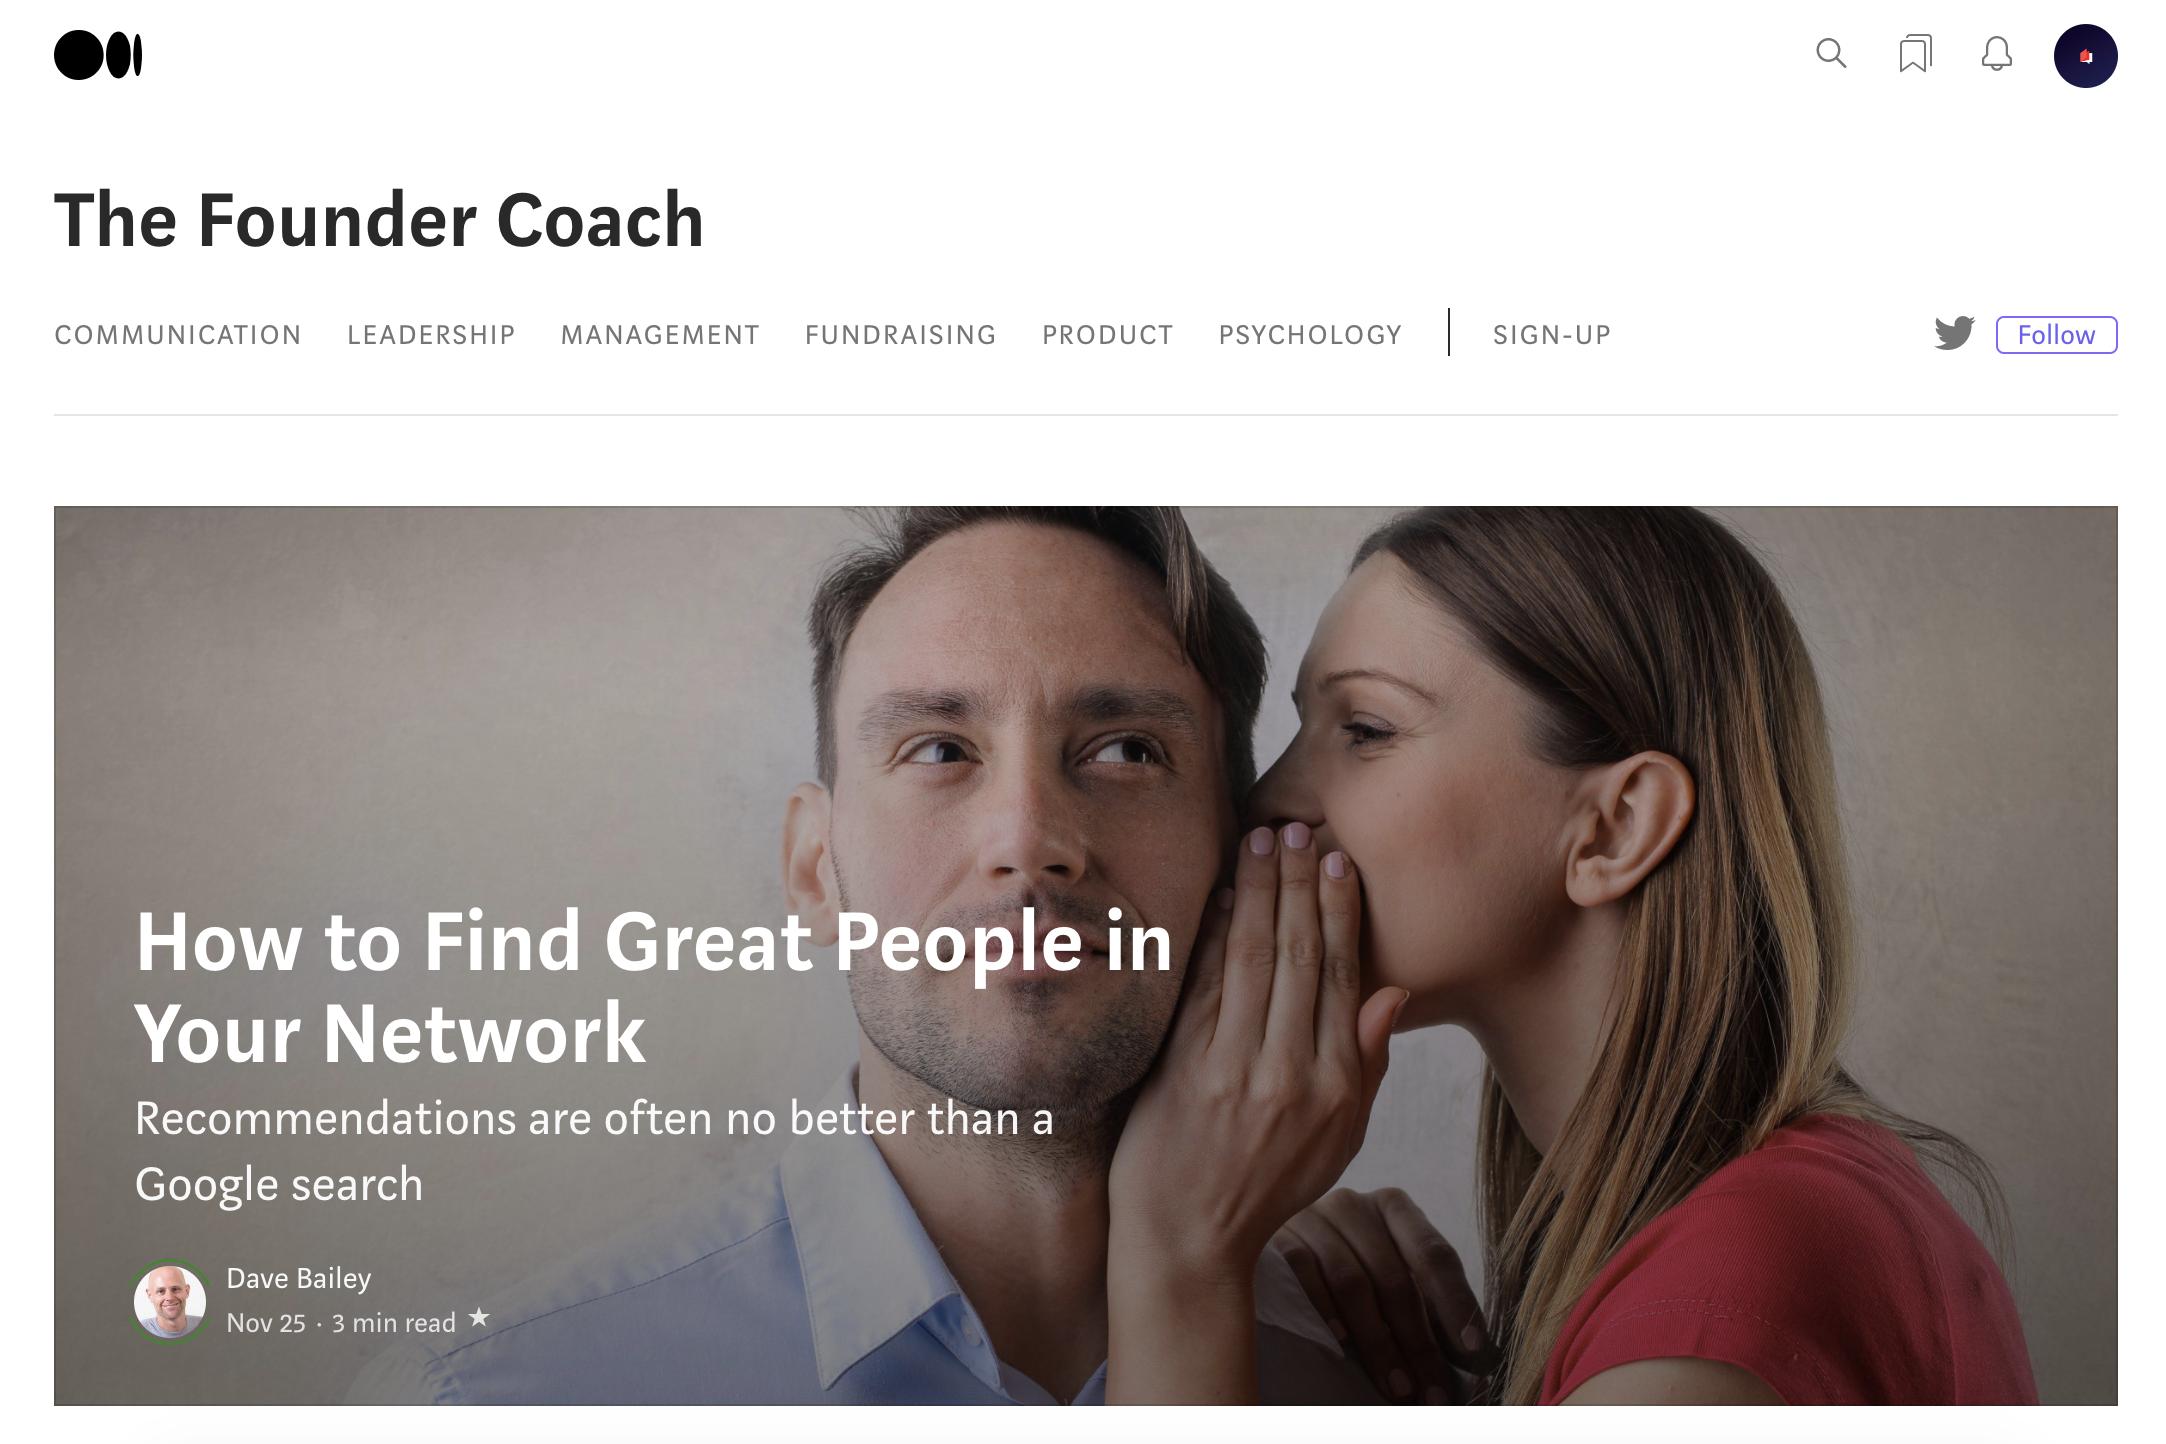 Entrepreneur blogs #27: The Founder Coach